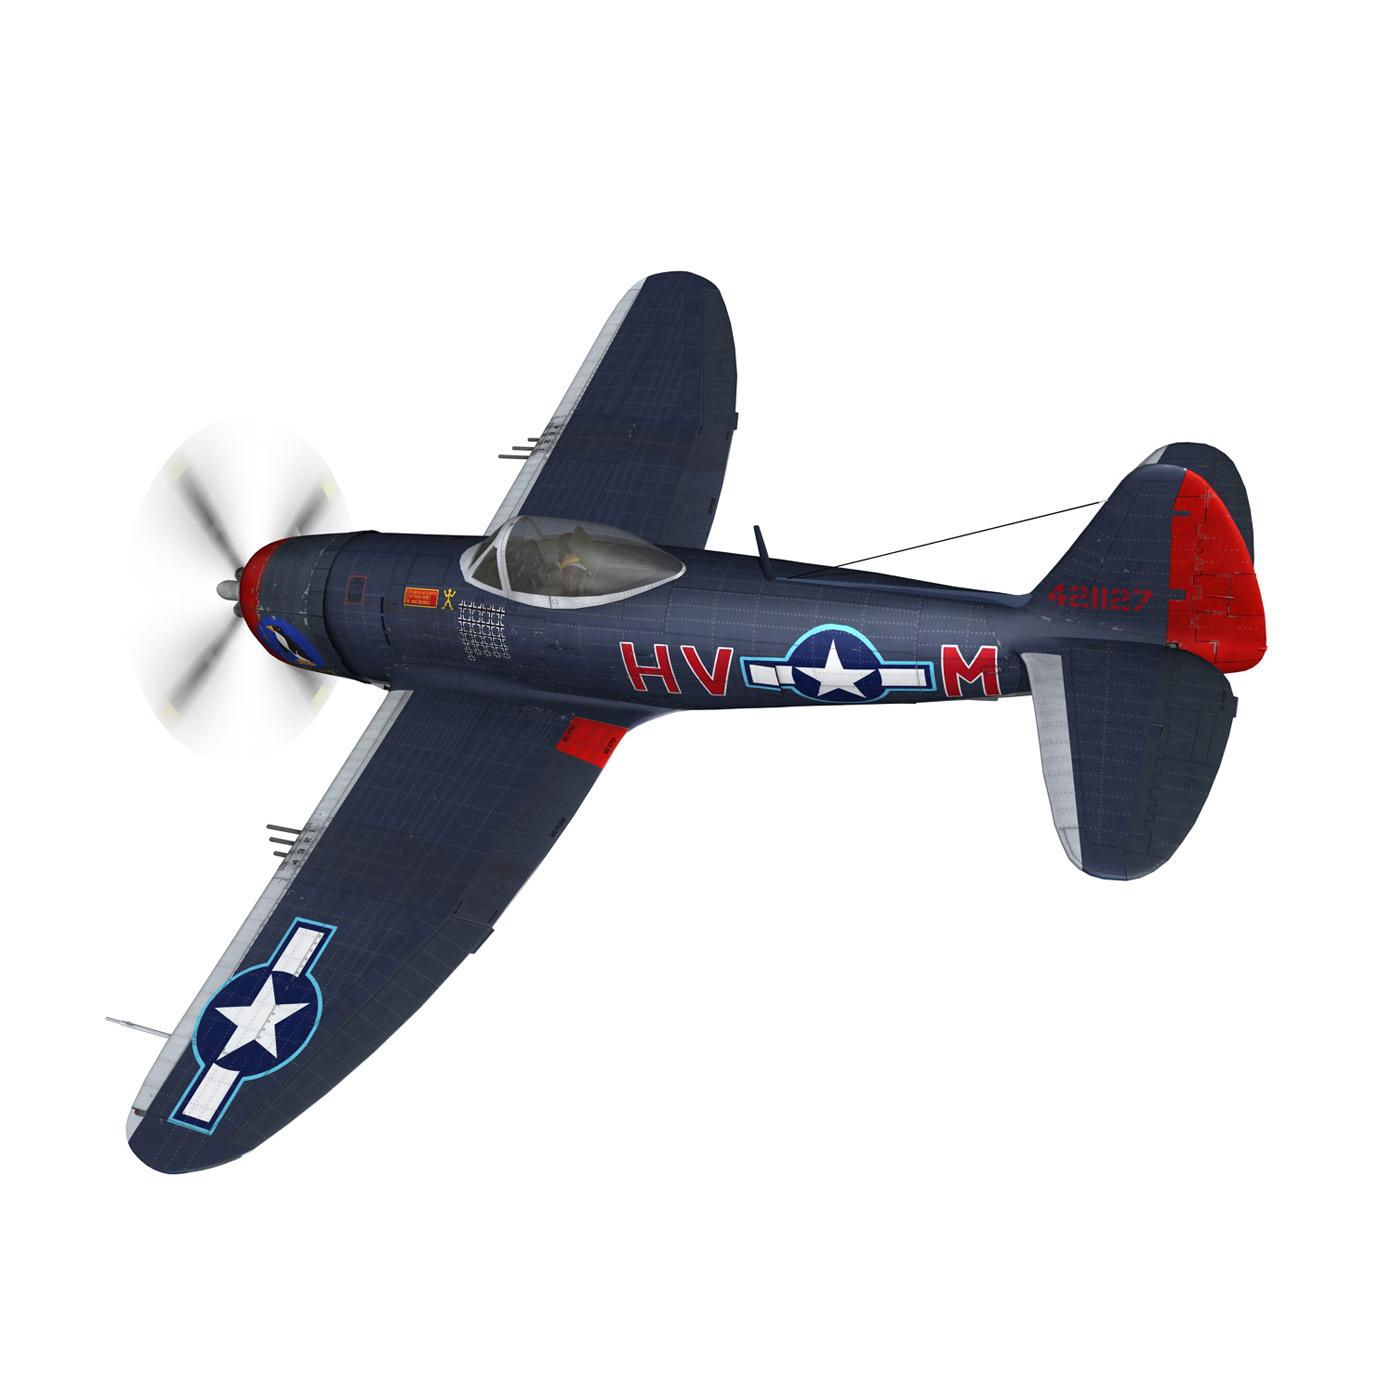 republic p-47m thunderbolt – pengie v 3d model 3ds c4d fbx lwo lw lws obj 279718